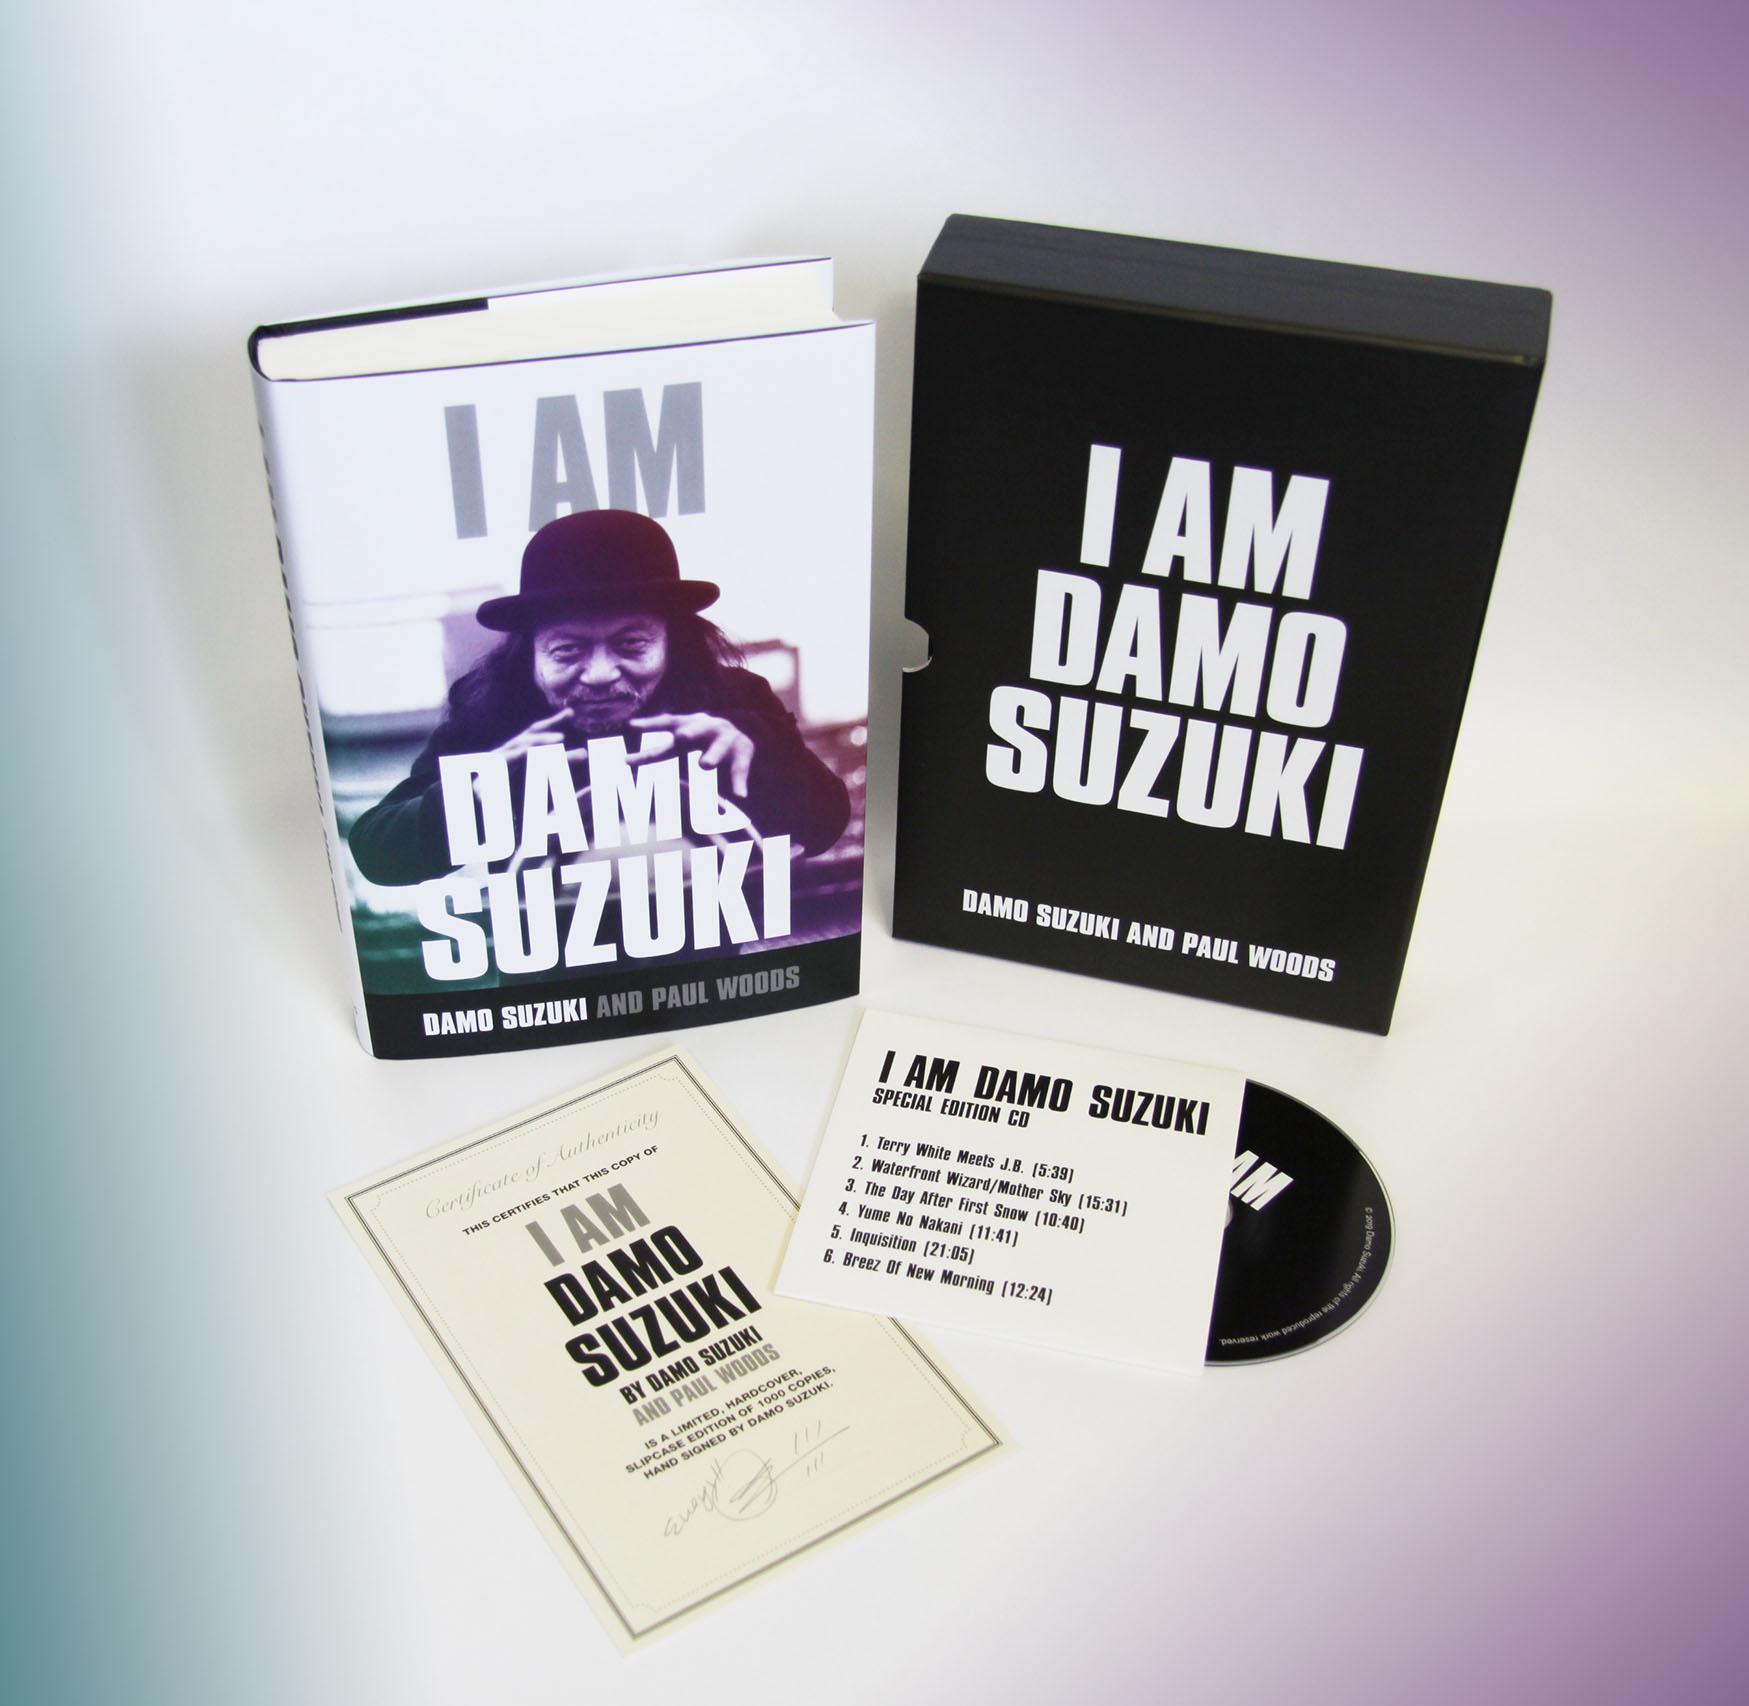 Damo suzuki packshot colours